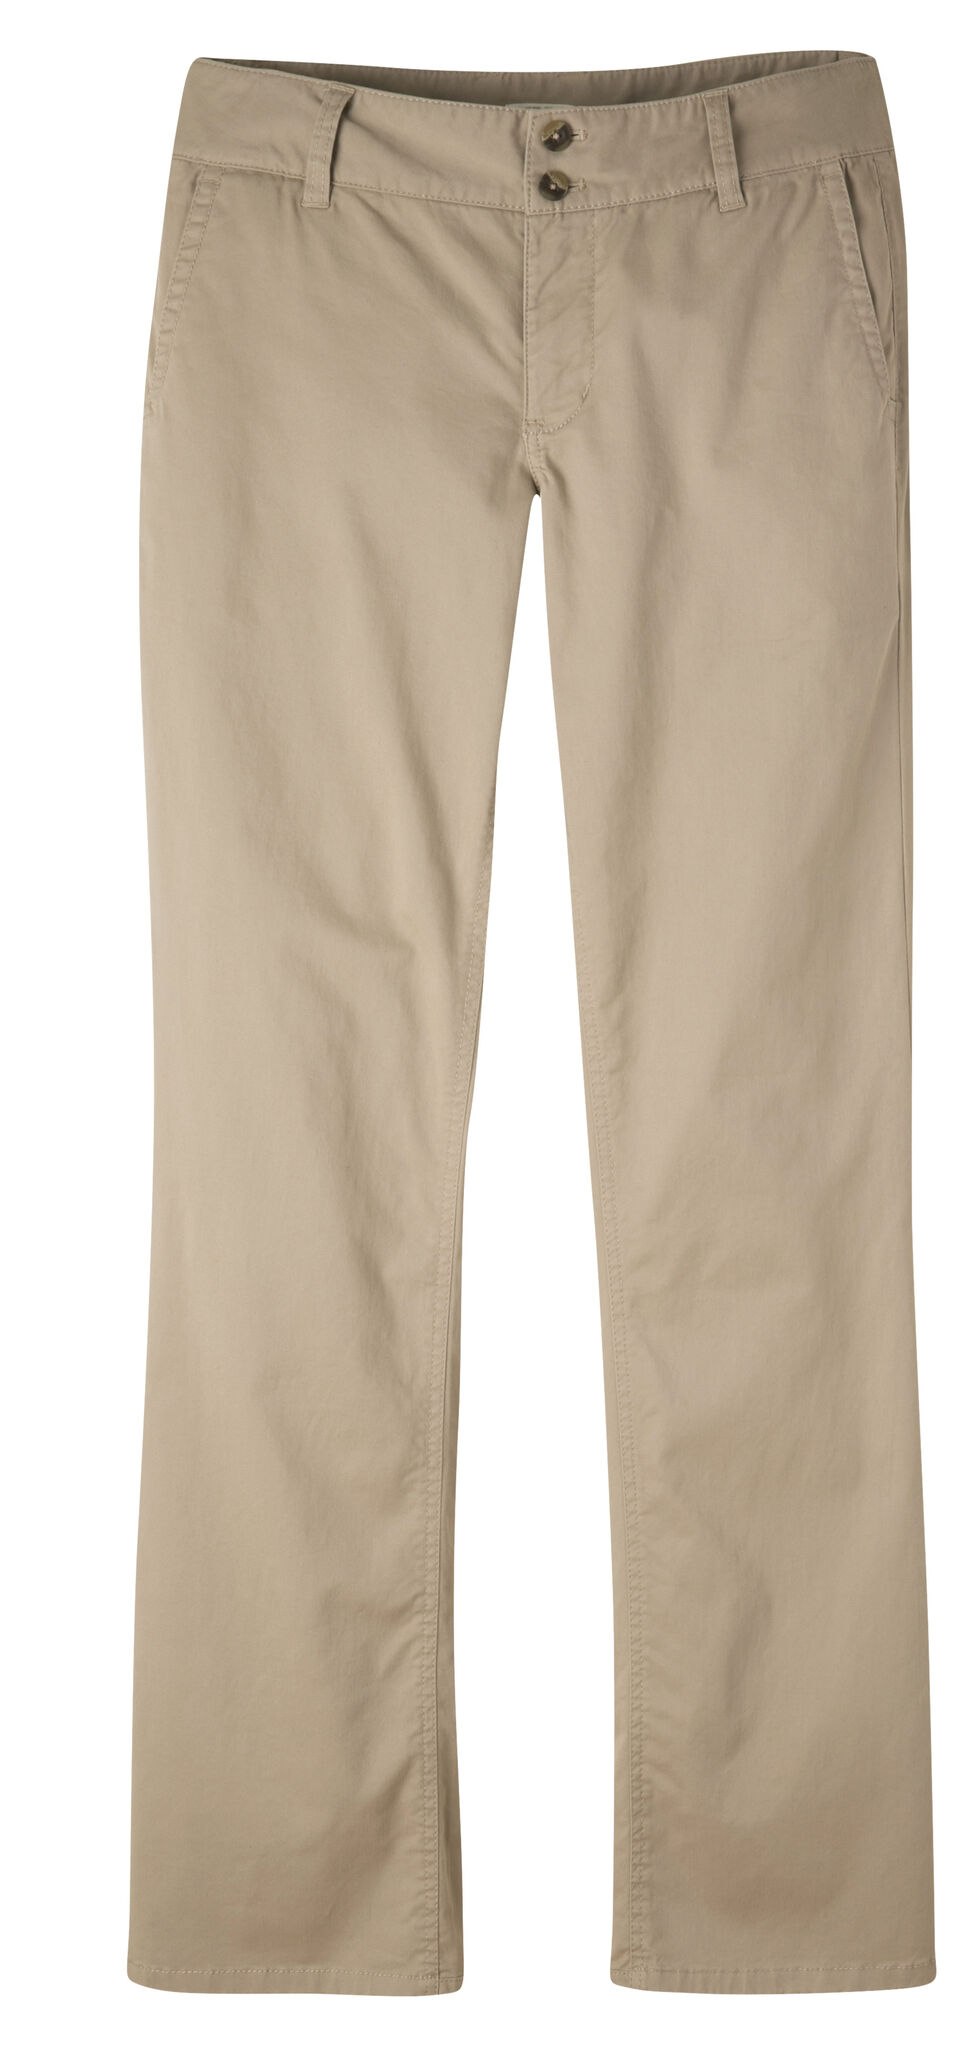 Mountain Khakis Women's Sadie Chino Pants - Petite, Beige, hi-res